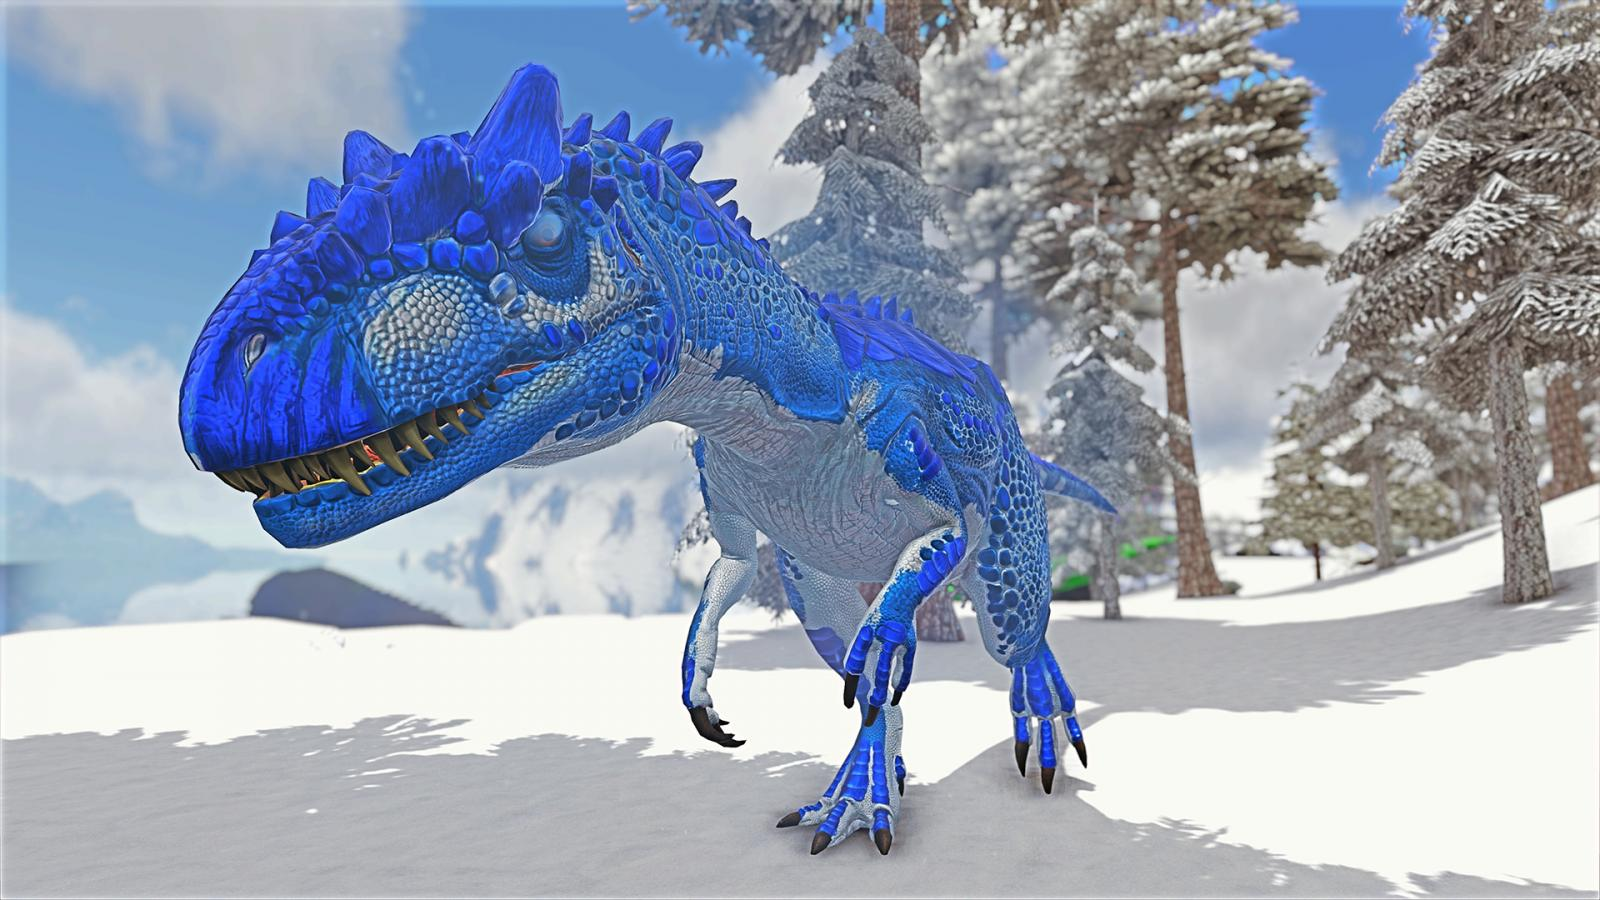 large.5aa707db8dbb2_BlueDragon-IceIceAllo-FreeStyle.jpg